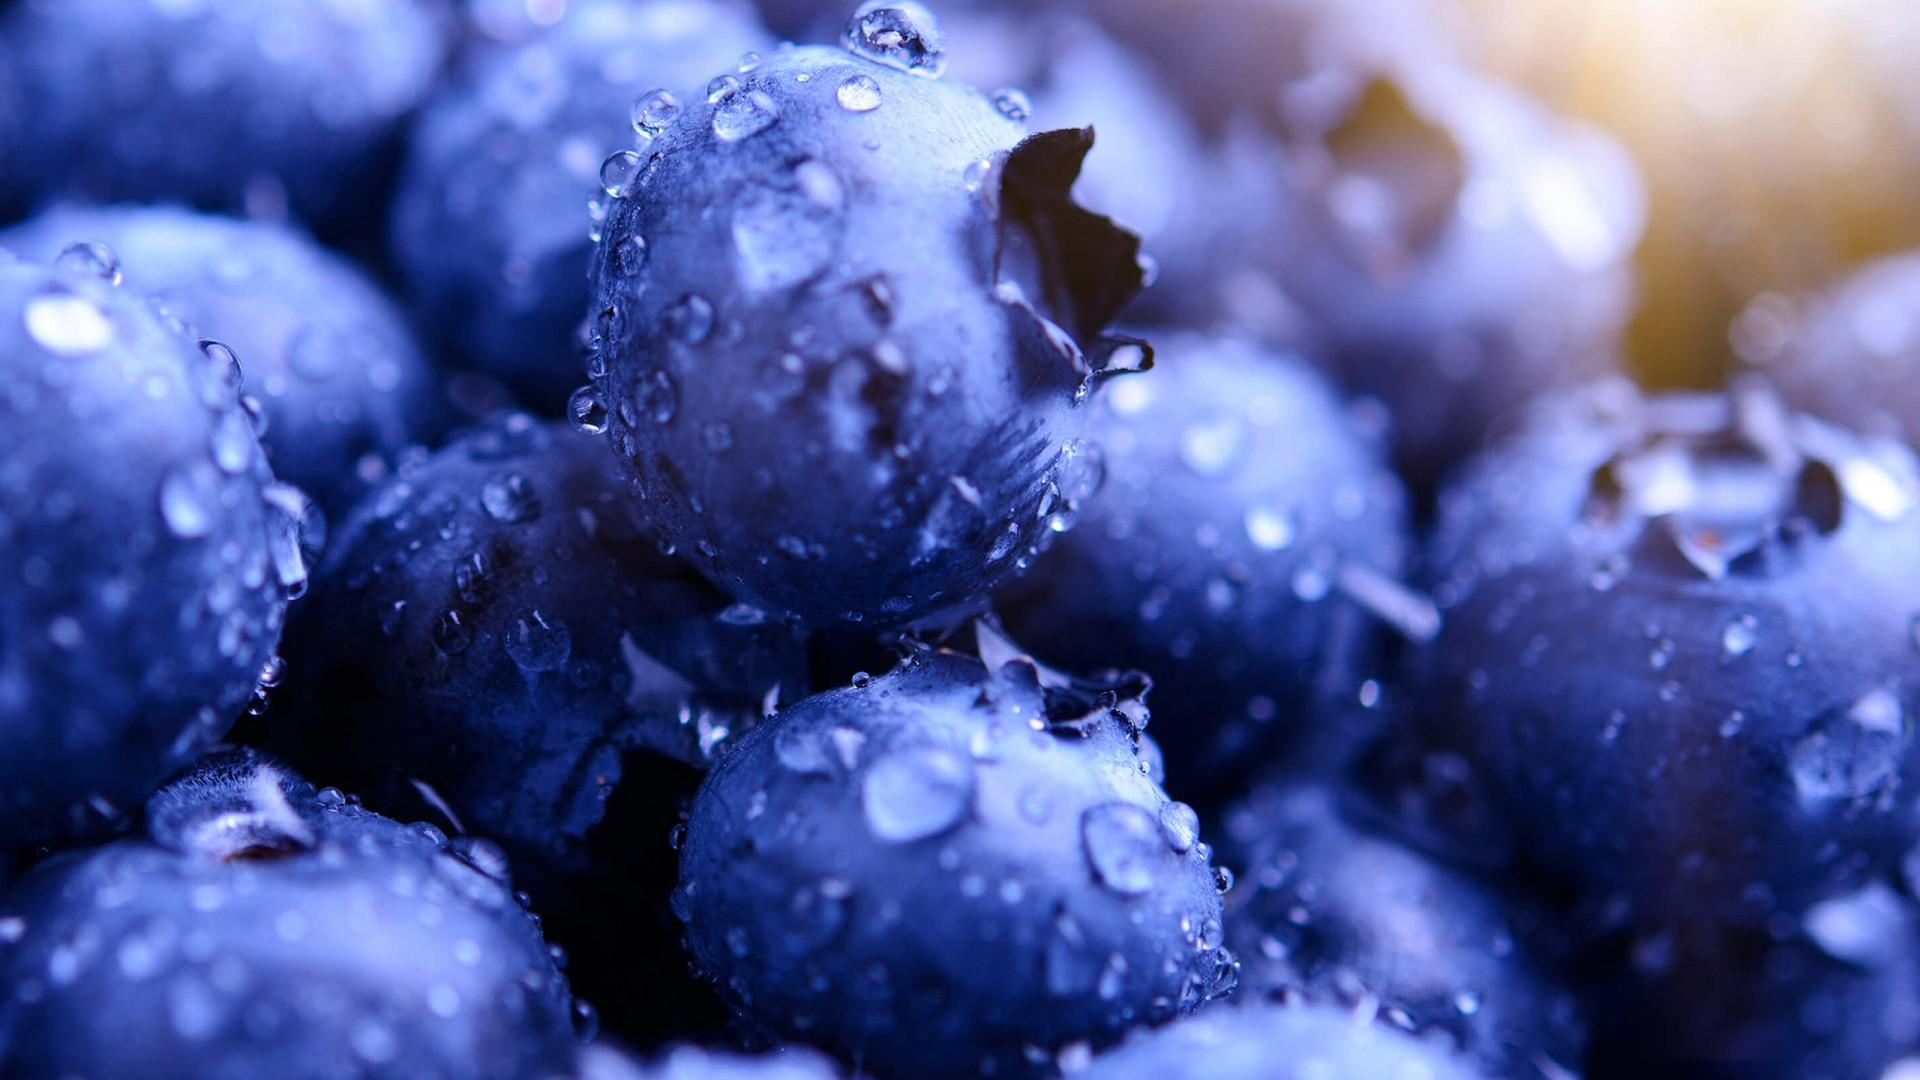 Cute Kitchen Wallpaper Blueberries Hd Wallpapers Hd Wallpapers Id 22914